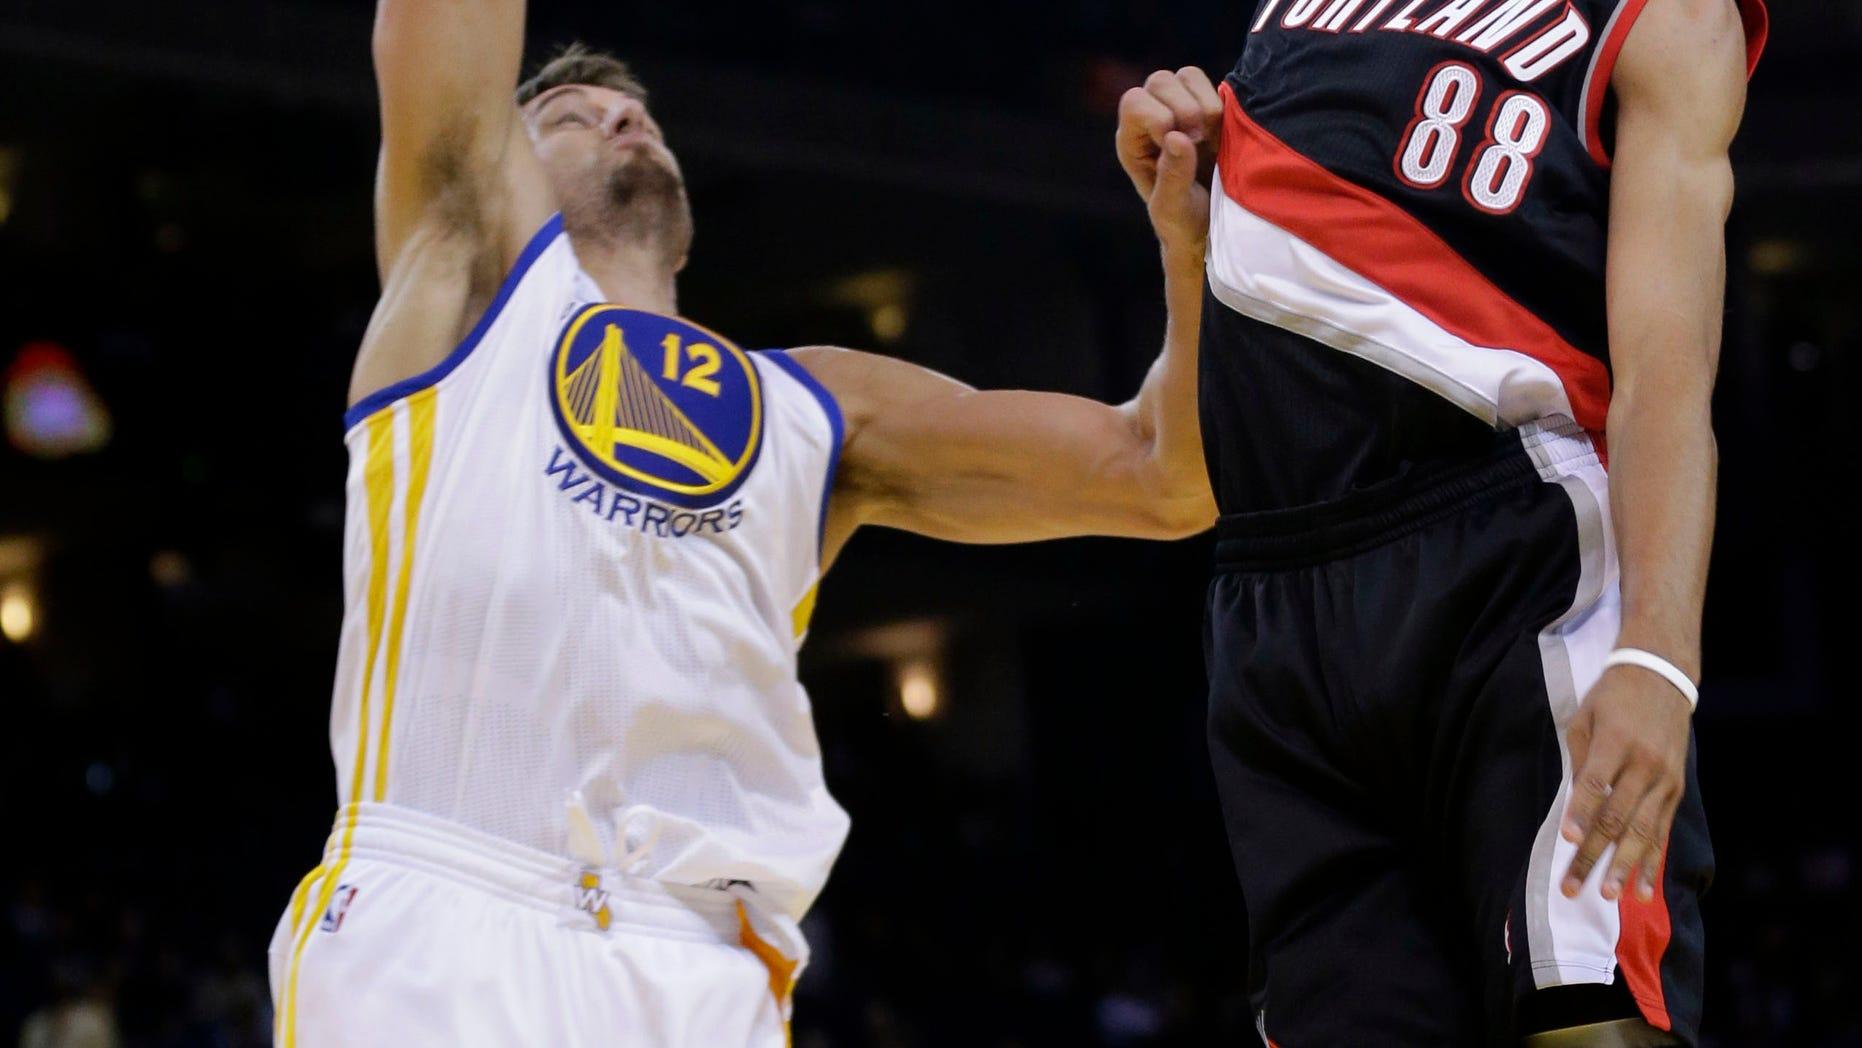 Portland Trail Blazers' Nicolas Batum (88) shoots over Golden State Warriors' Andrew Bogut during the first half of an NBA preseason basketball game on Thursday, Oct. 24, 2013, in Oakland, Calif. (AP Photo/Marcio Jose Sanchez)